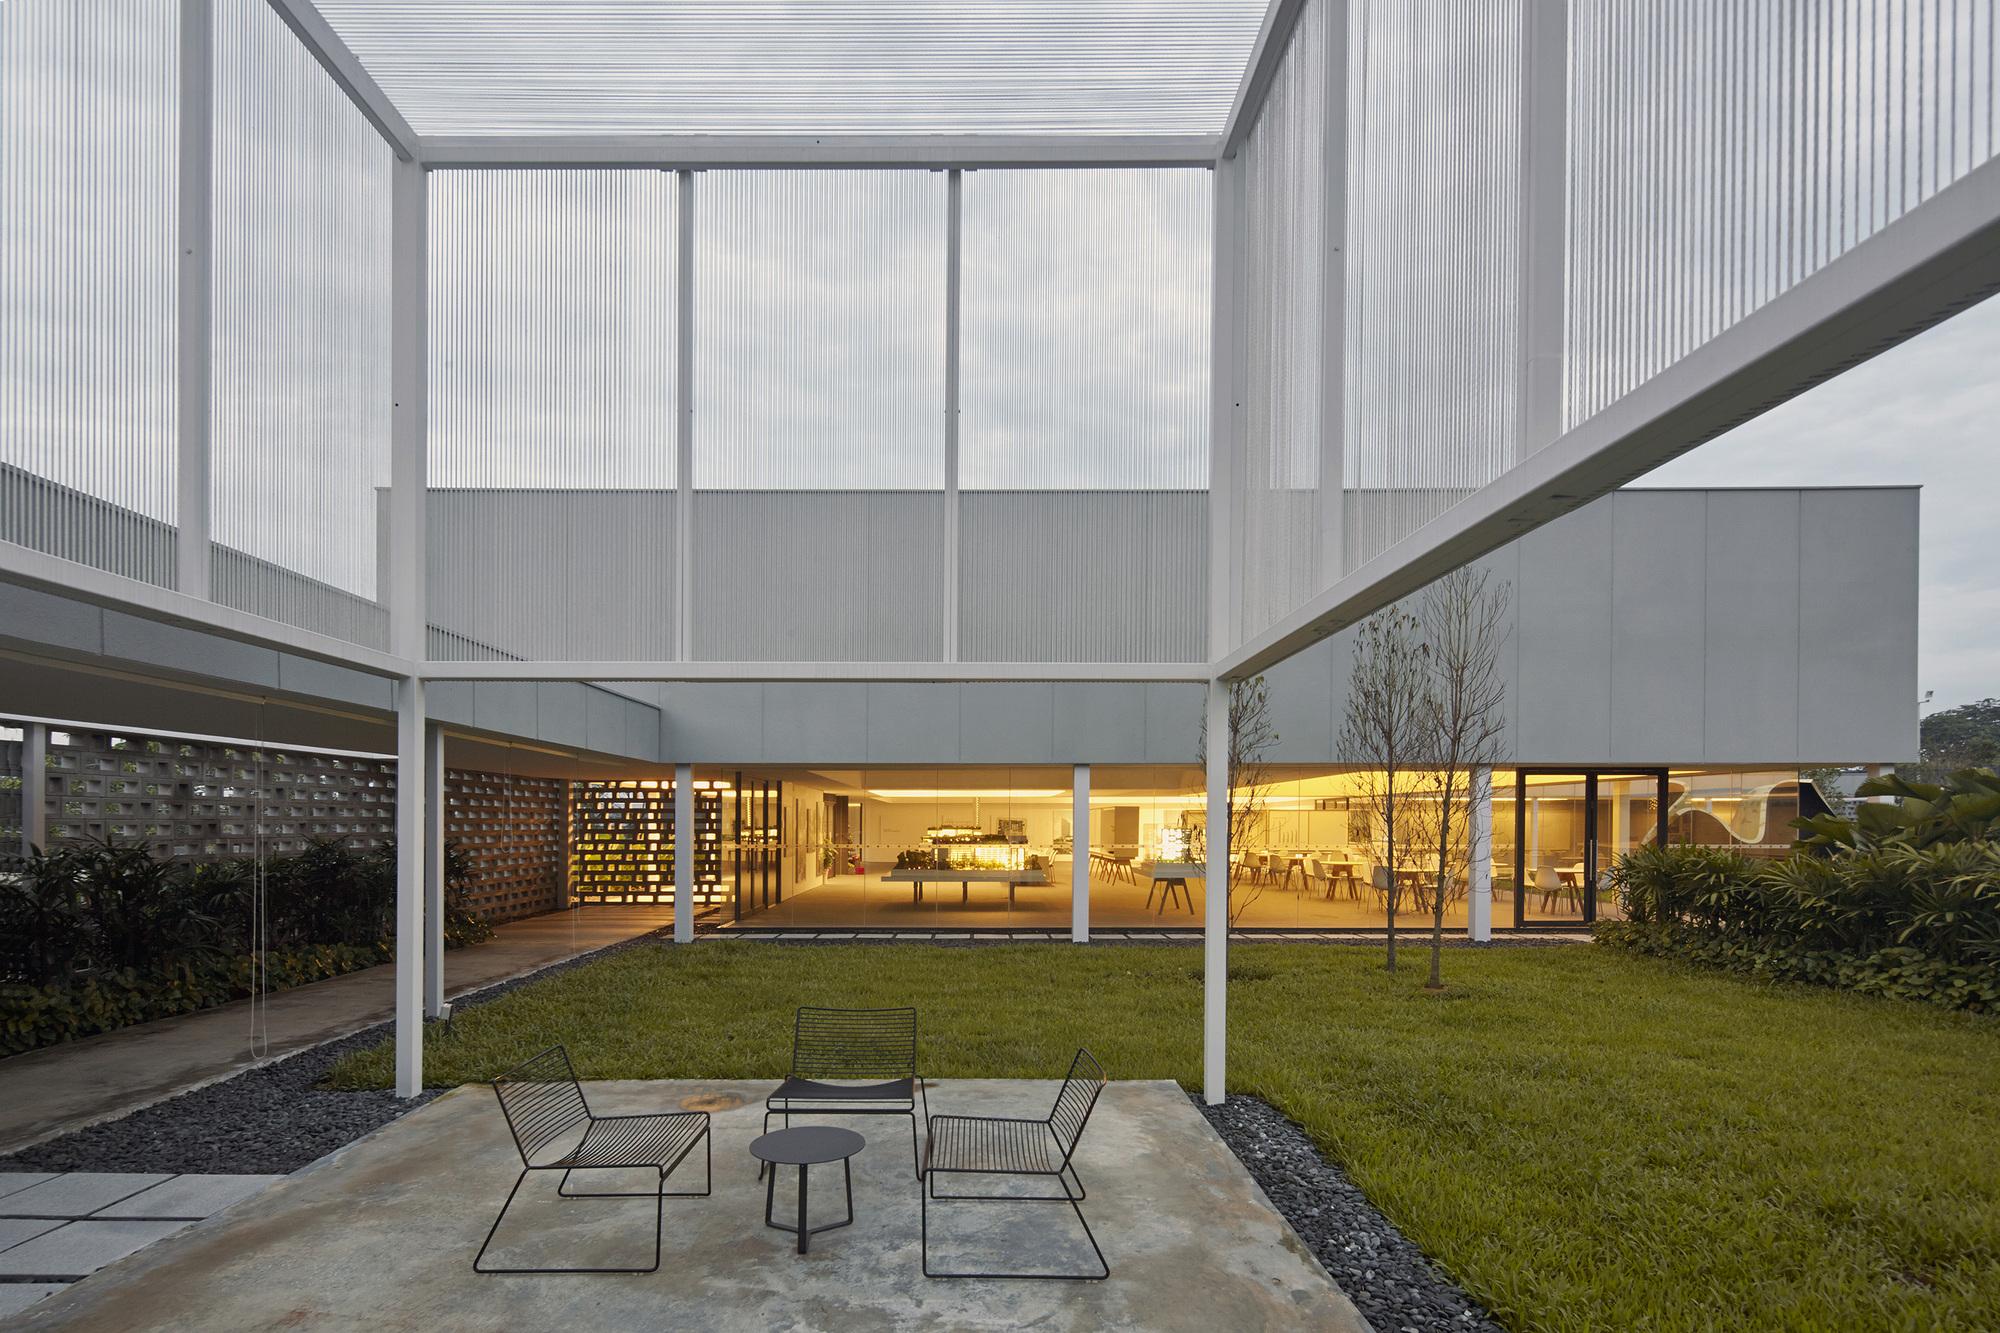 Industrial Estate Gallery Carverhaggard Archdaily